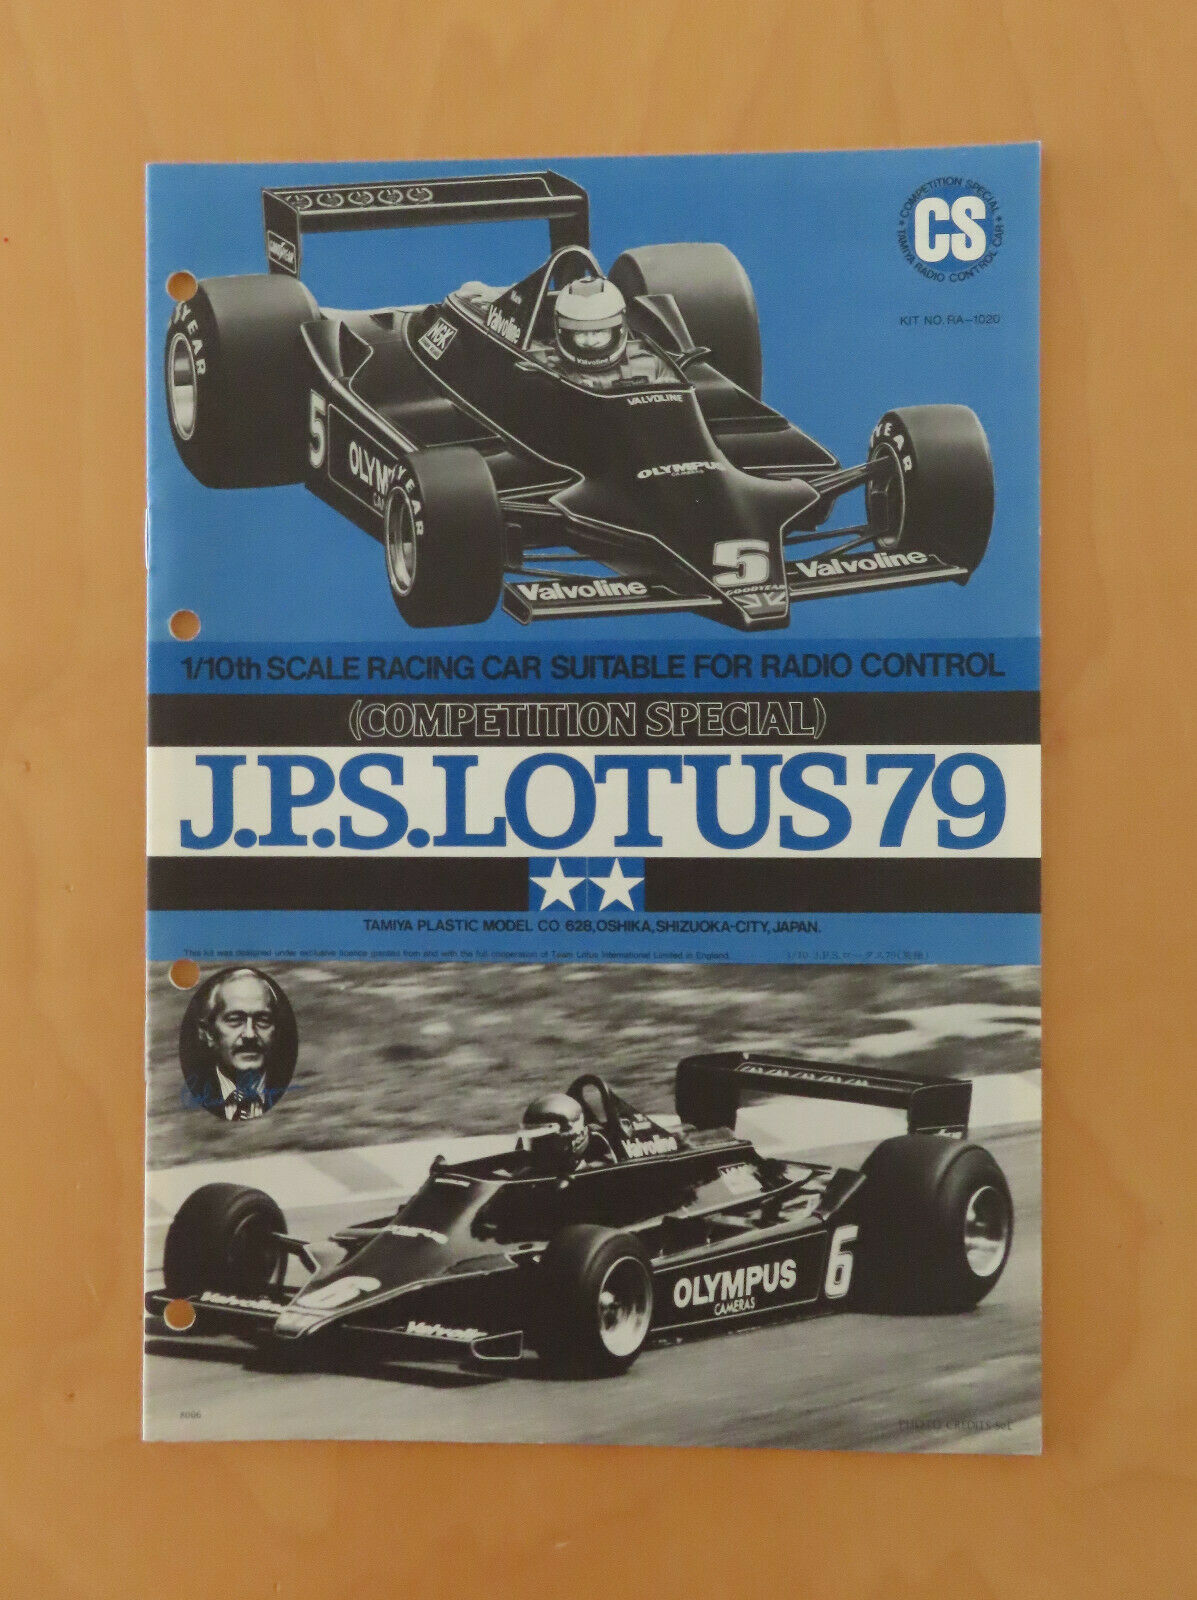 RC TAMIYA MANUALE JPS Lotus 79 CS 58020, RA1020 NUOVA 1980